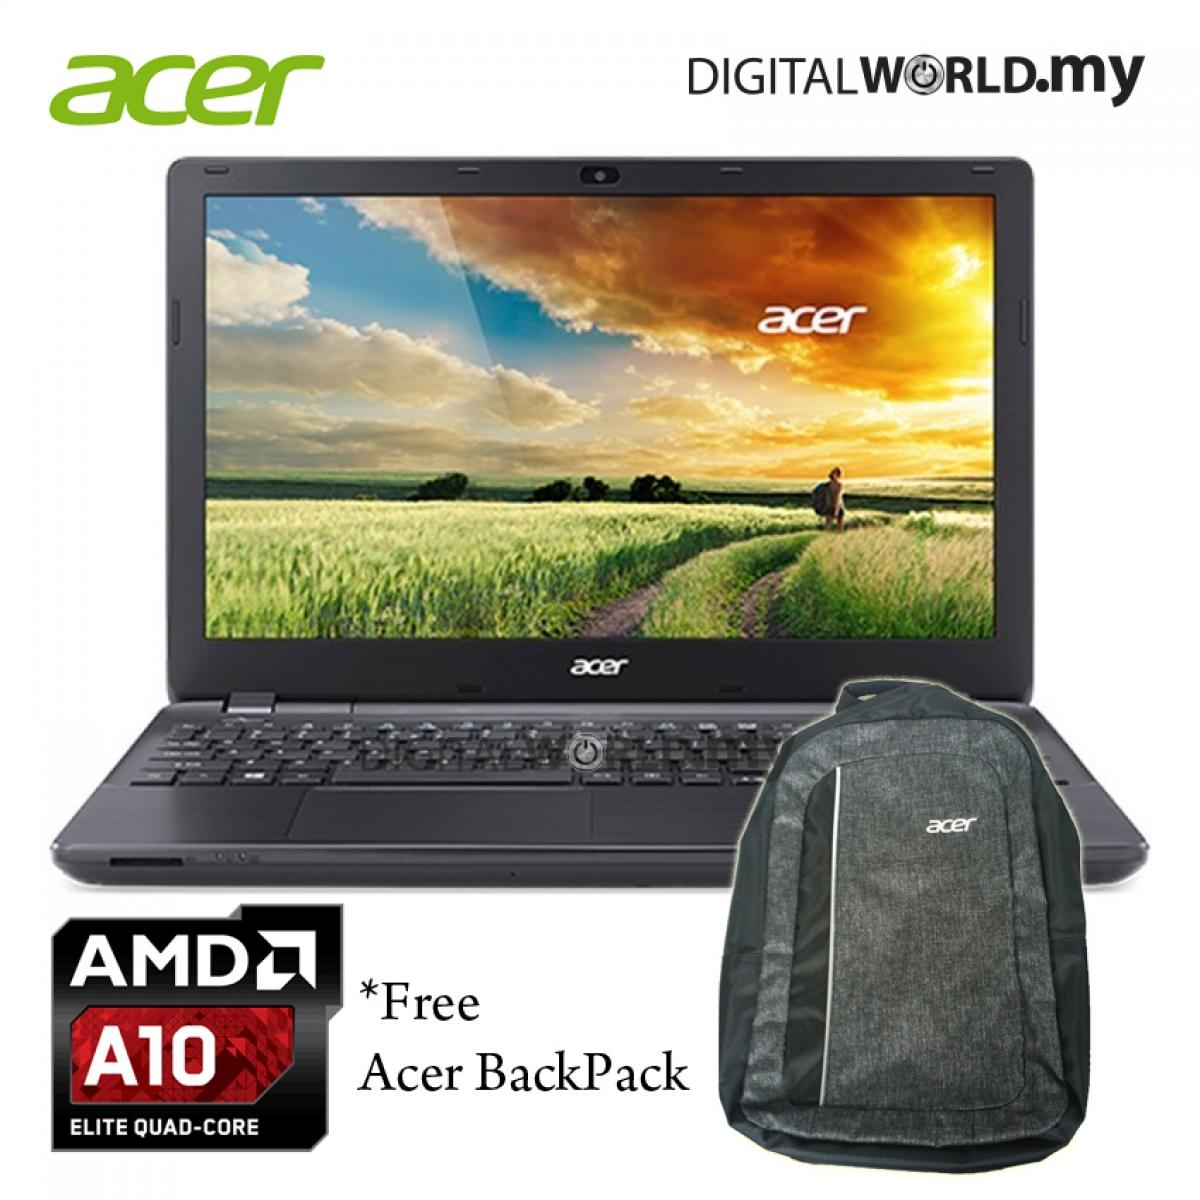 Acer Aspire E5-551G-T30H (AMD A10-7300/4GB/1TB. ‹ ›